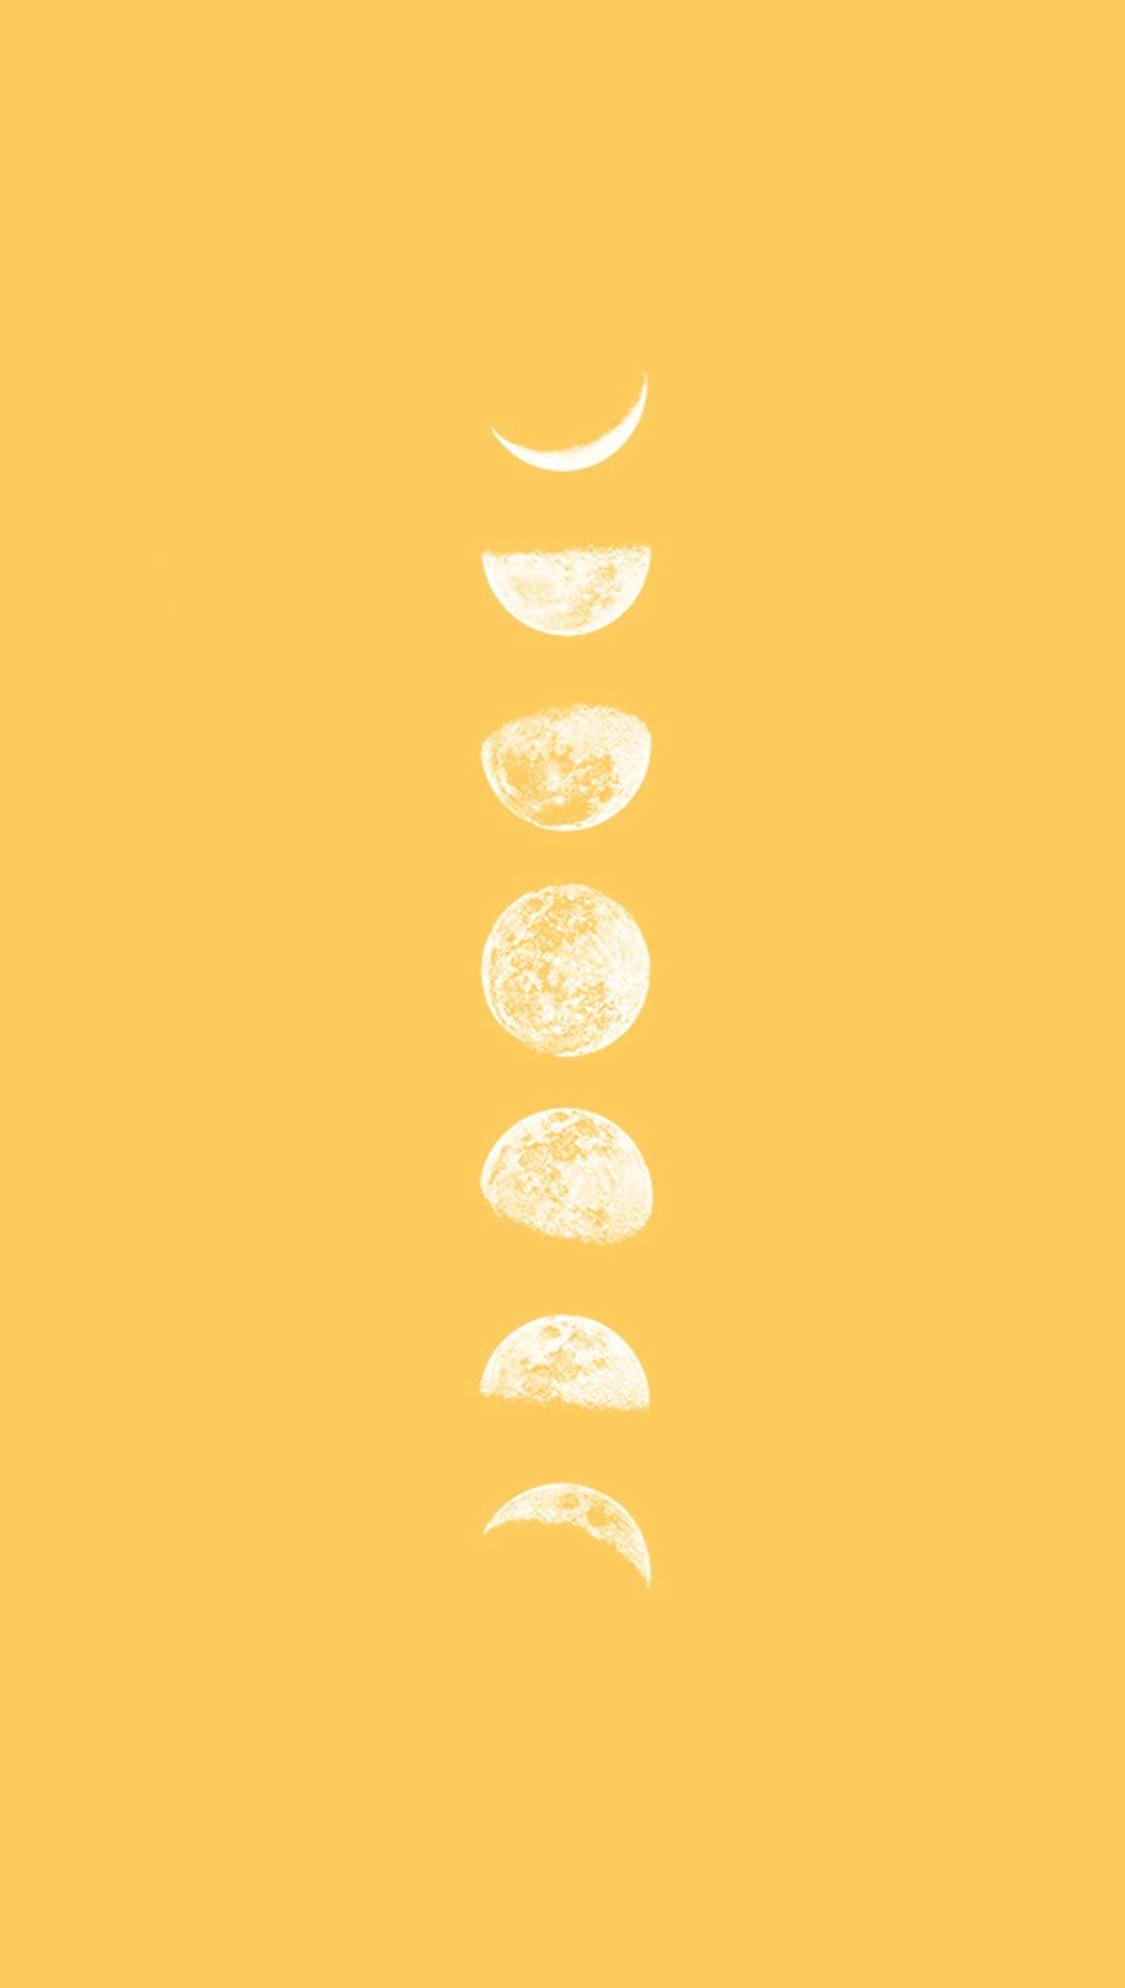 35 Yellow Aesthetic Wallpaper In 2020 Iphone Wallpaper Yellow Yellow Aesthetic Pastel Yellow Aesthetic